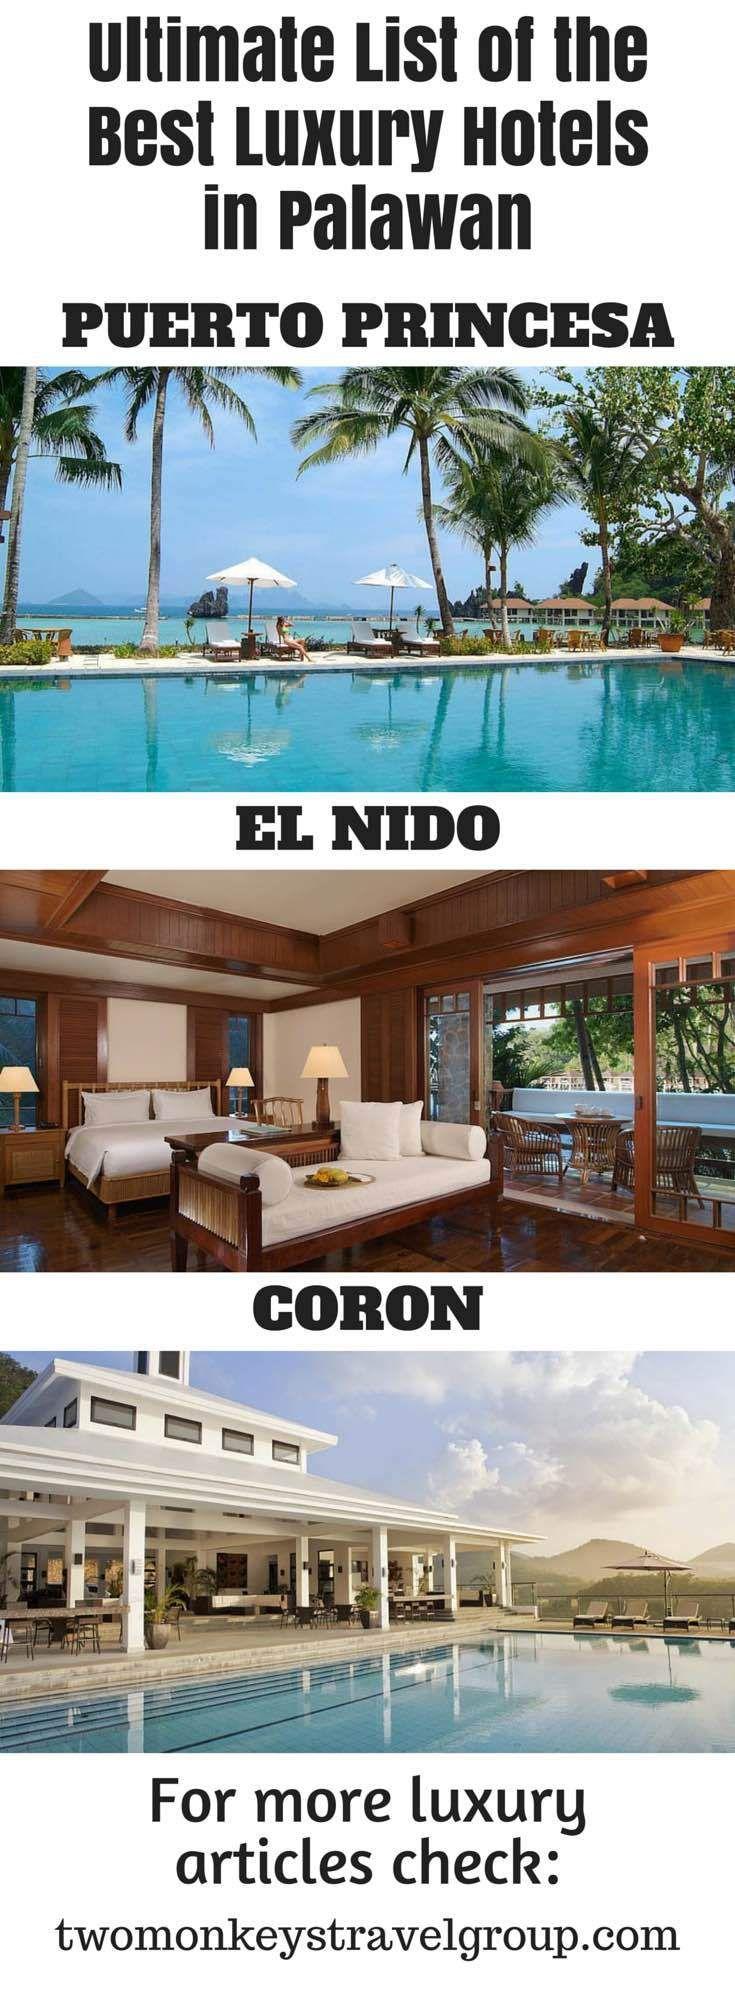 Ultimate List of the Best Luxury Hotels in Palawan https://neldascrafts.etsy.com